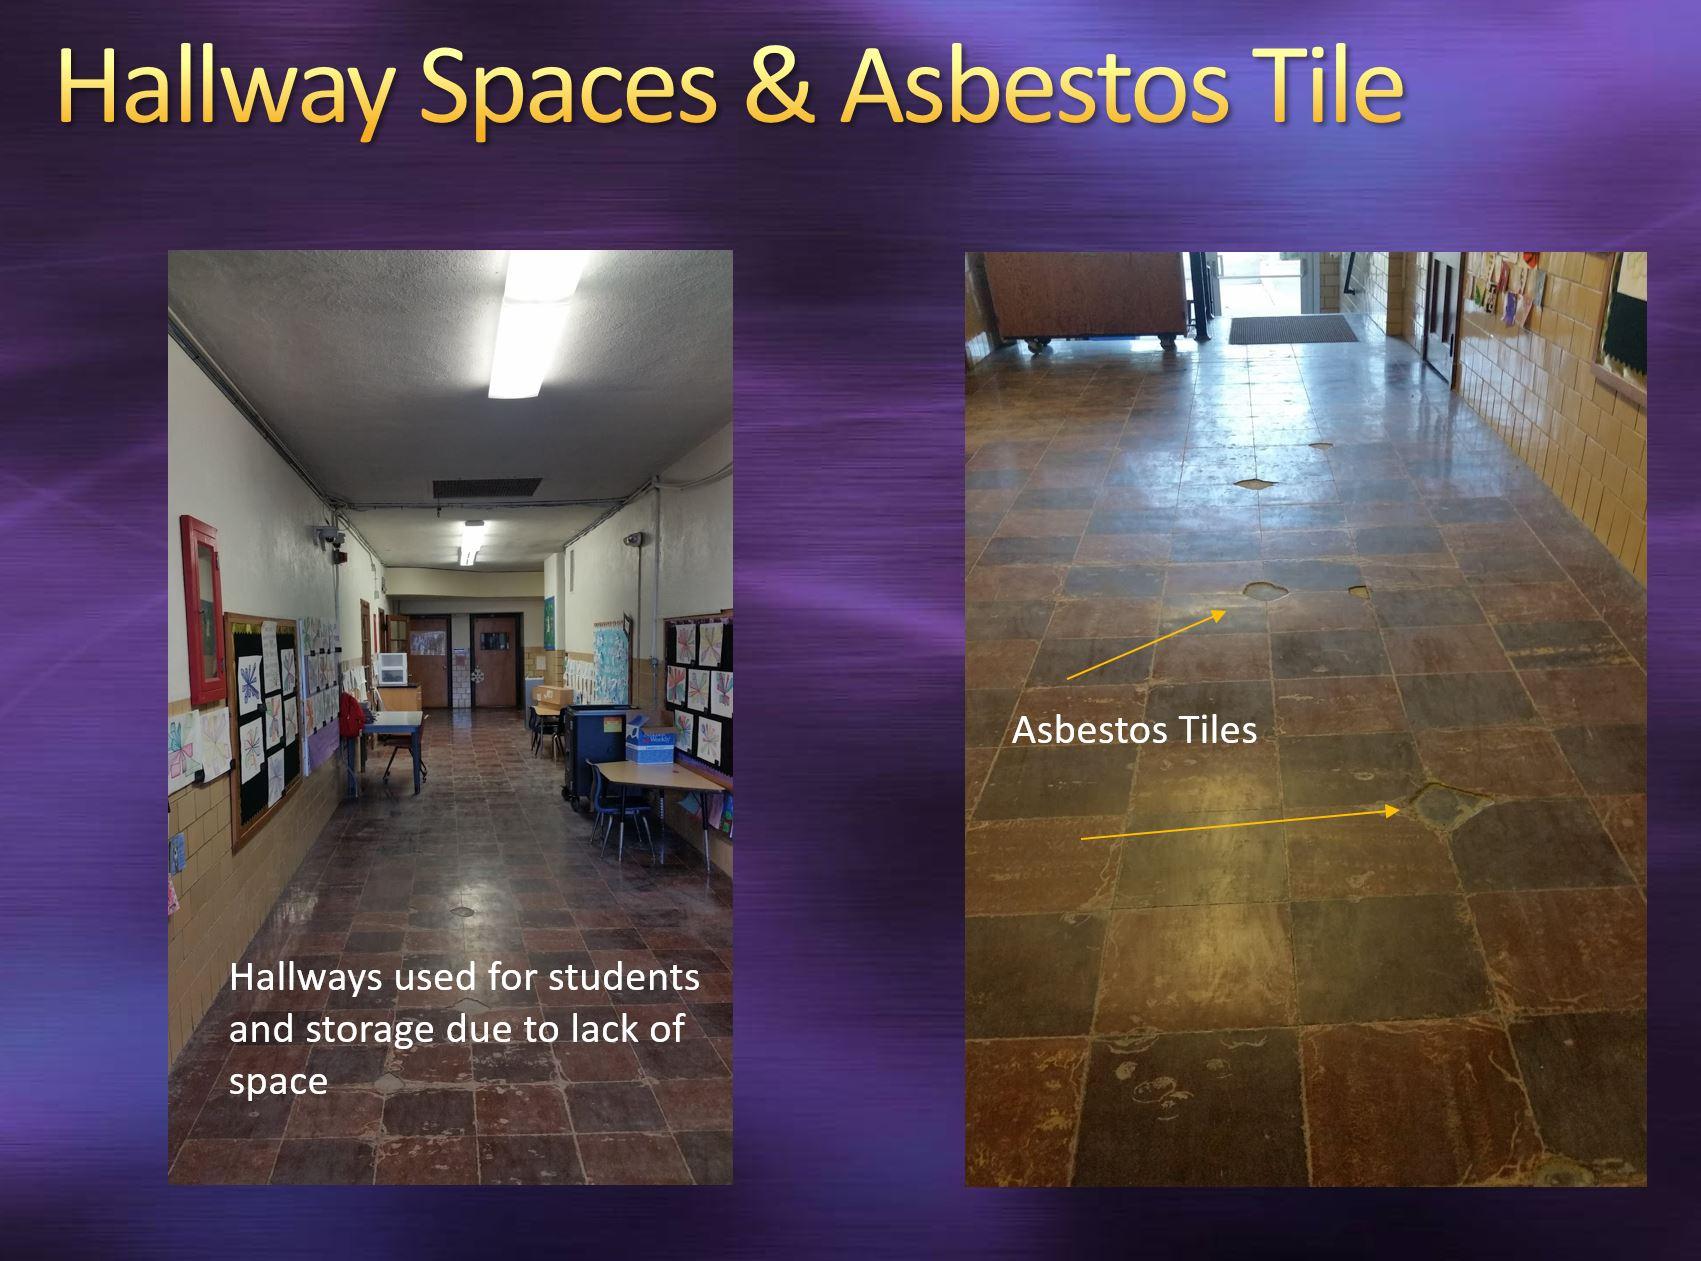 Hallway spaces and asbestos tile